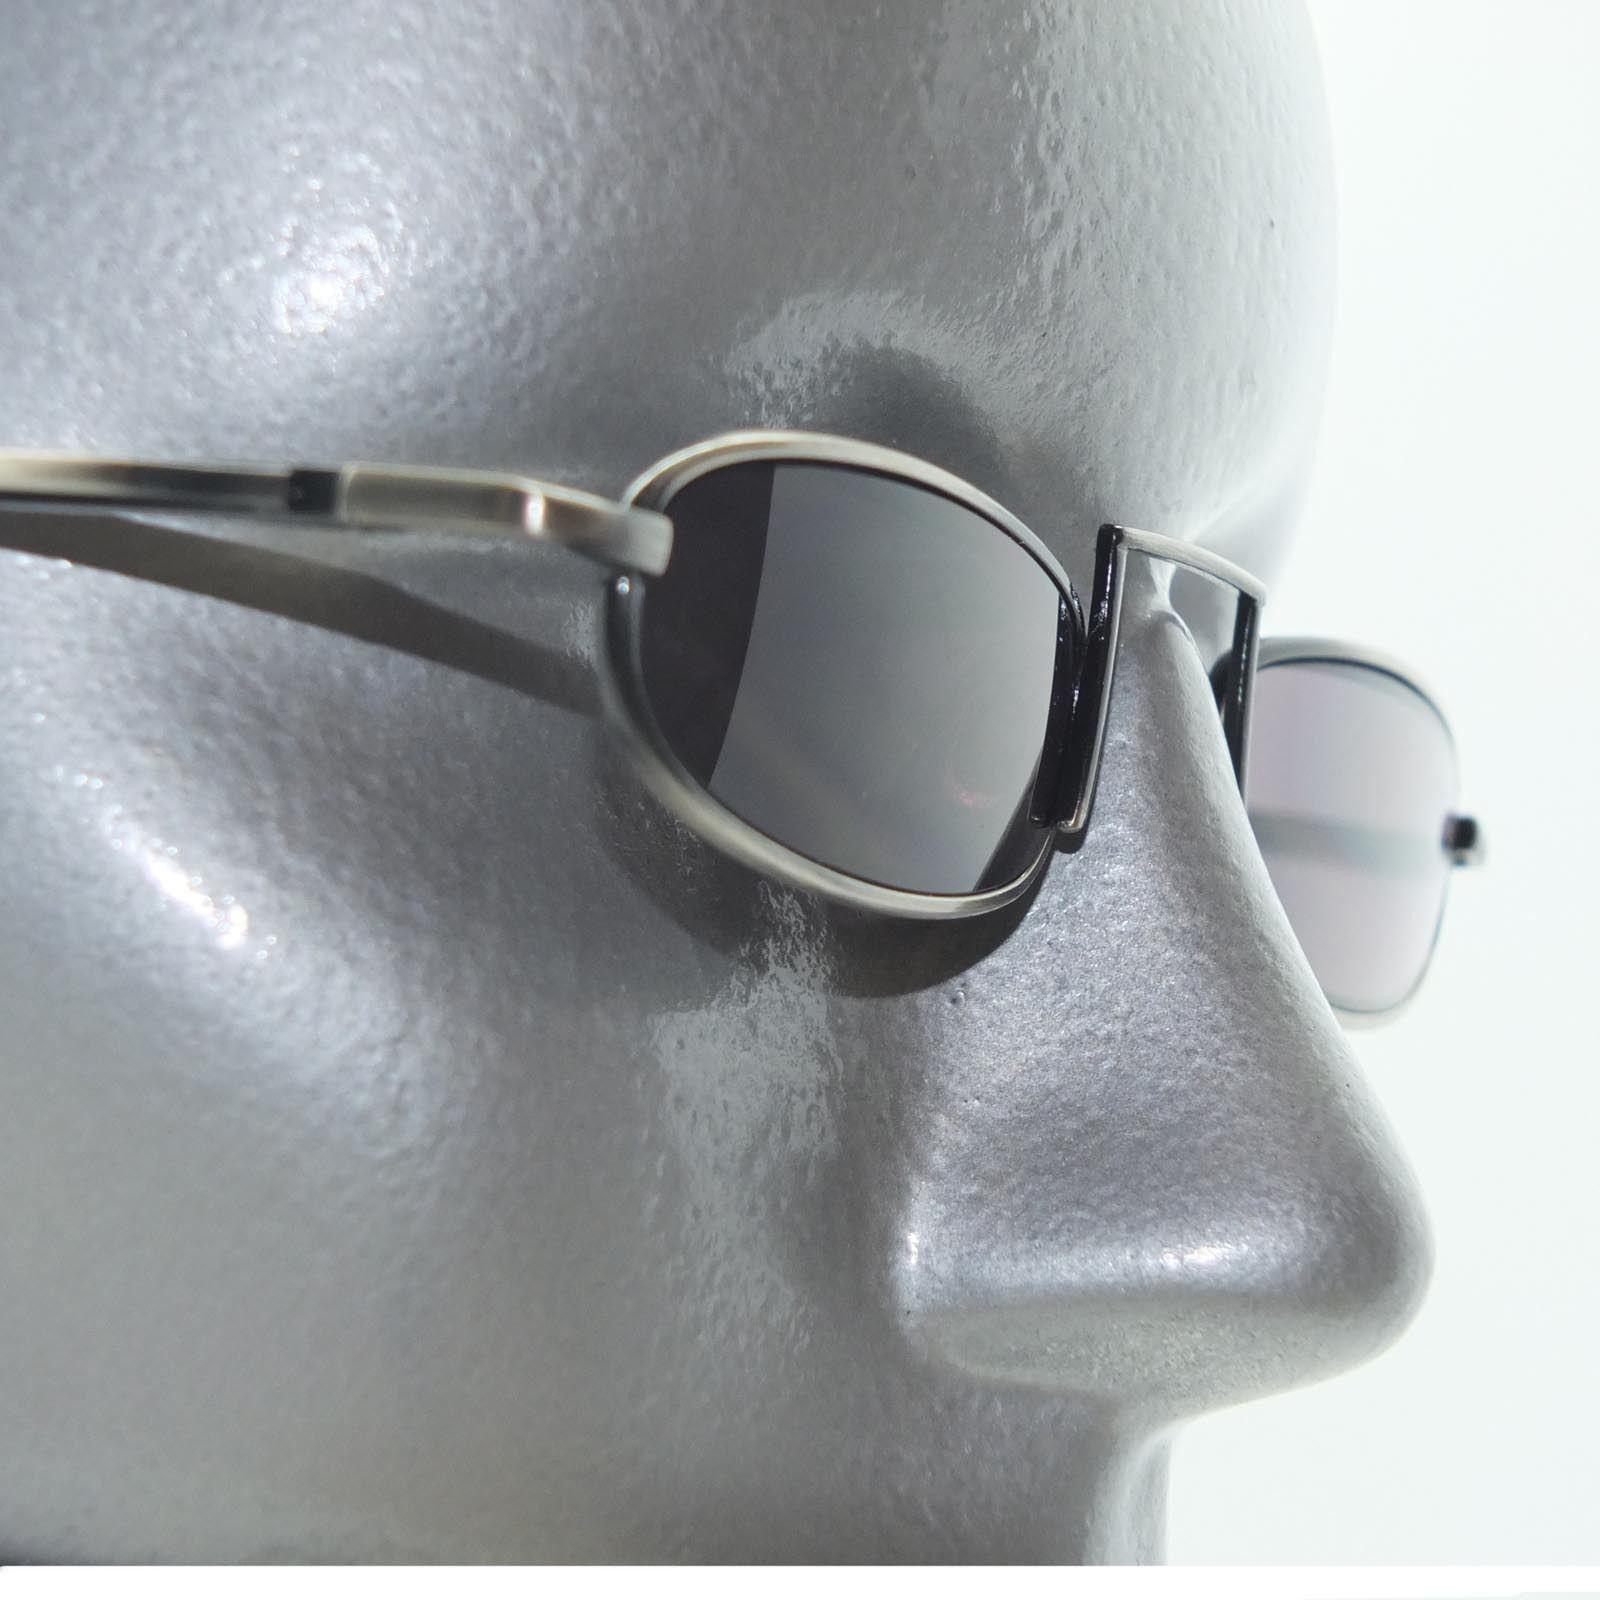 Narrow Frame Reading Glasses : Dark Tint Reading Glasses Xtreme Narrow Lens Boho Gray ...